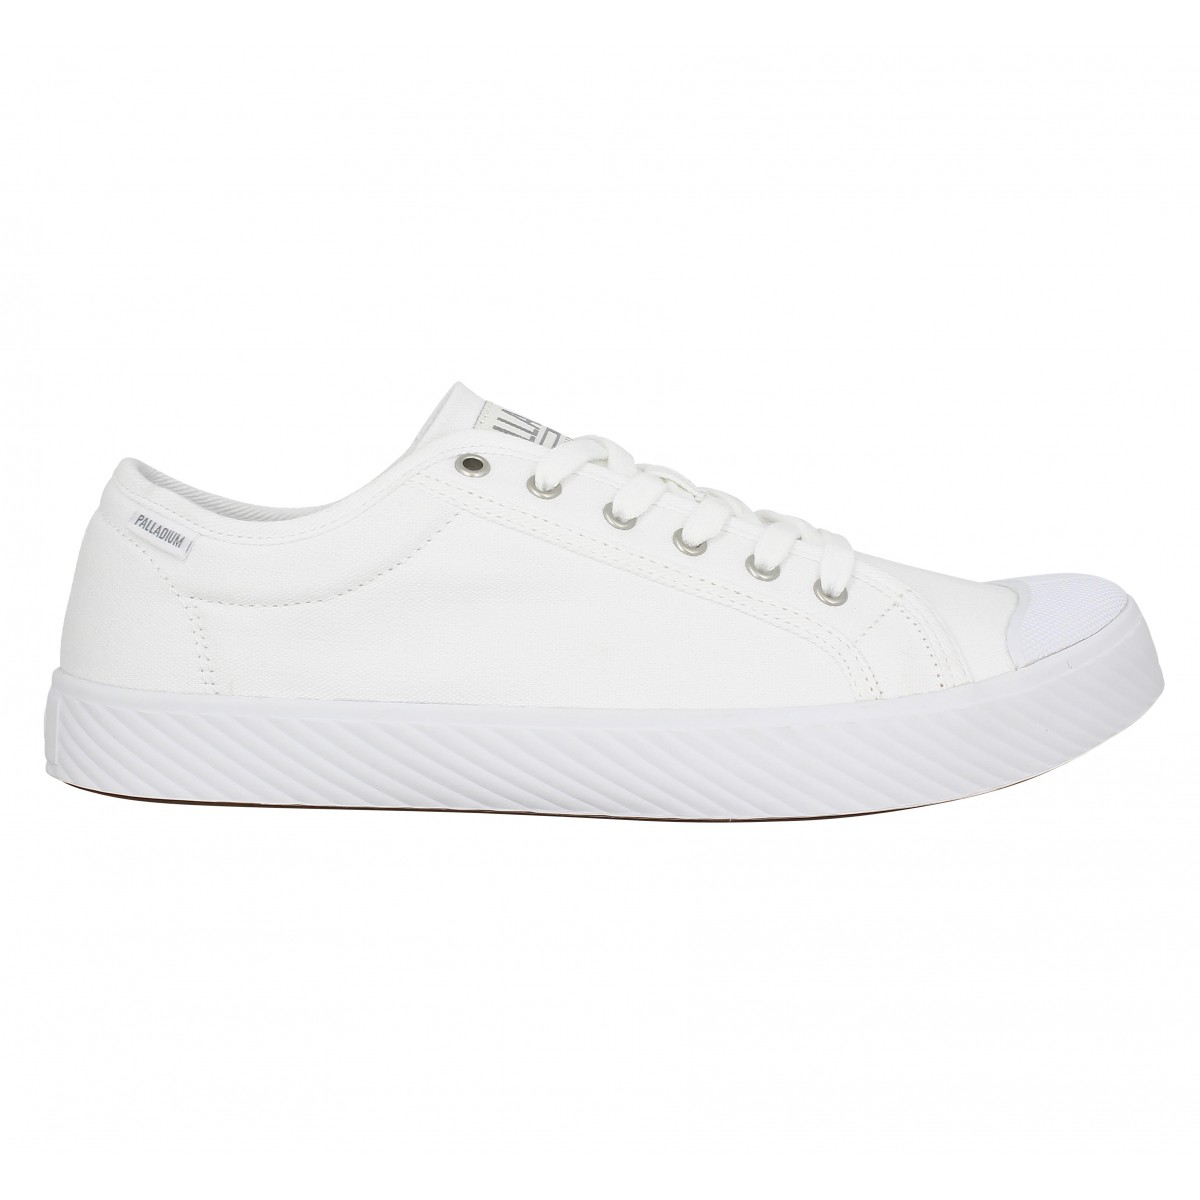 Phoenix Fanny Chaussures Toile Blanc Pl Homme Palladium 4qPO5AxwO